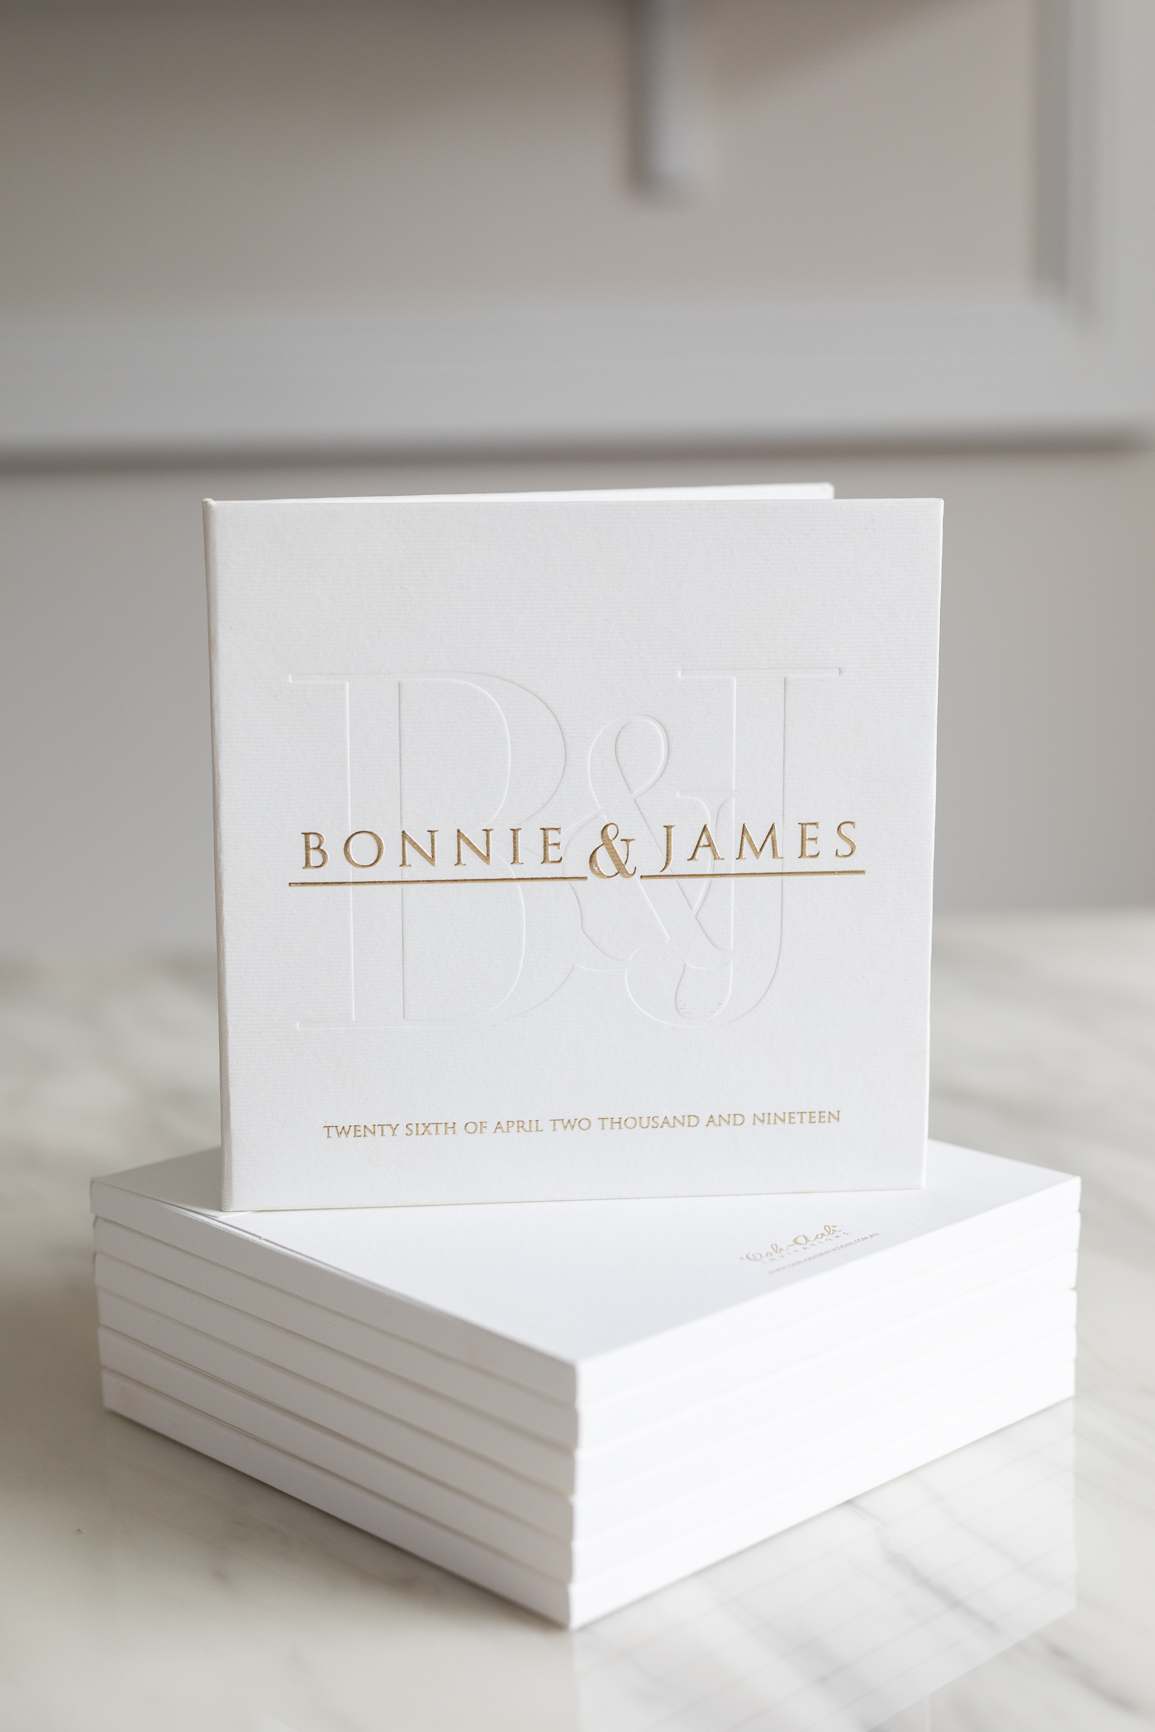 Modern letterpress invitation on hardcover booklet